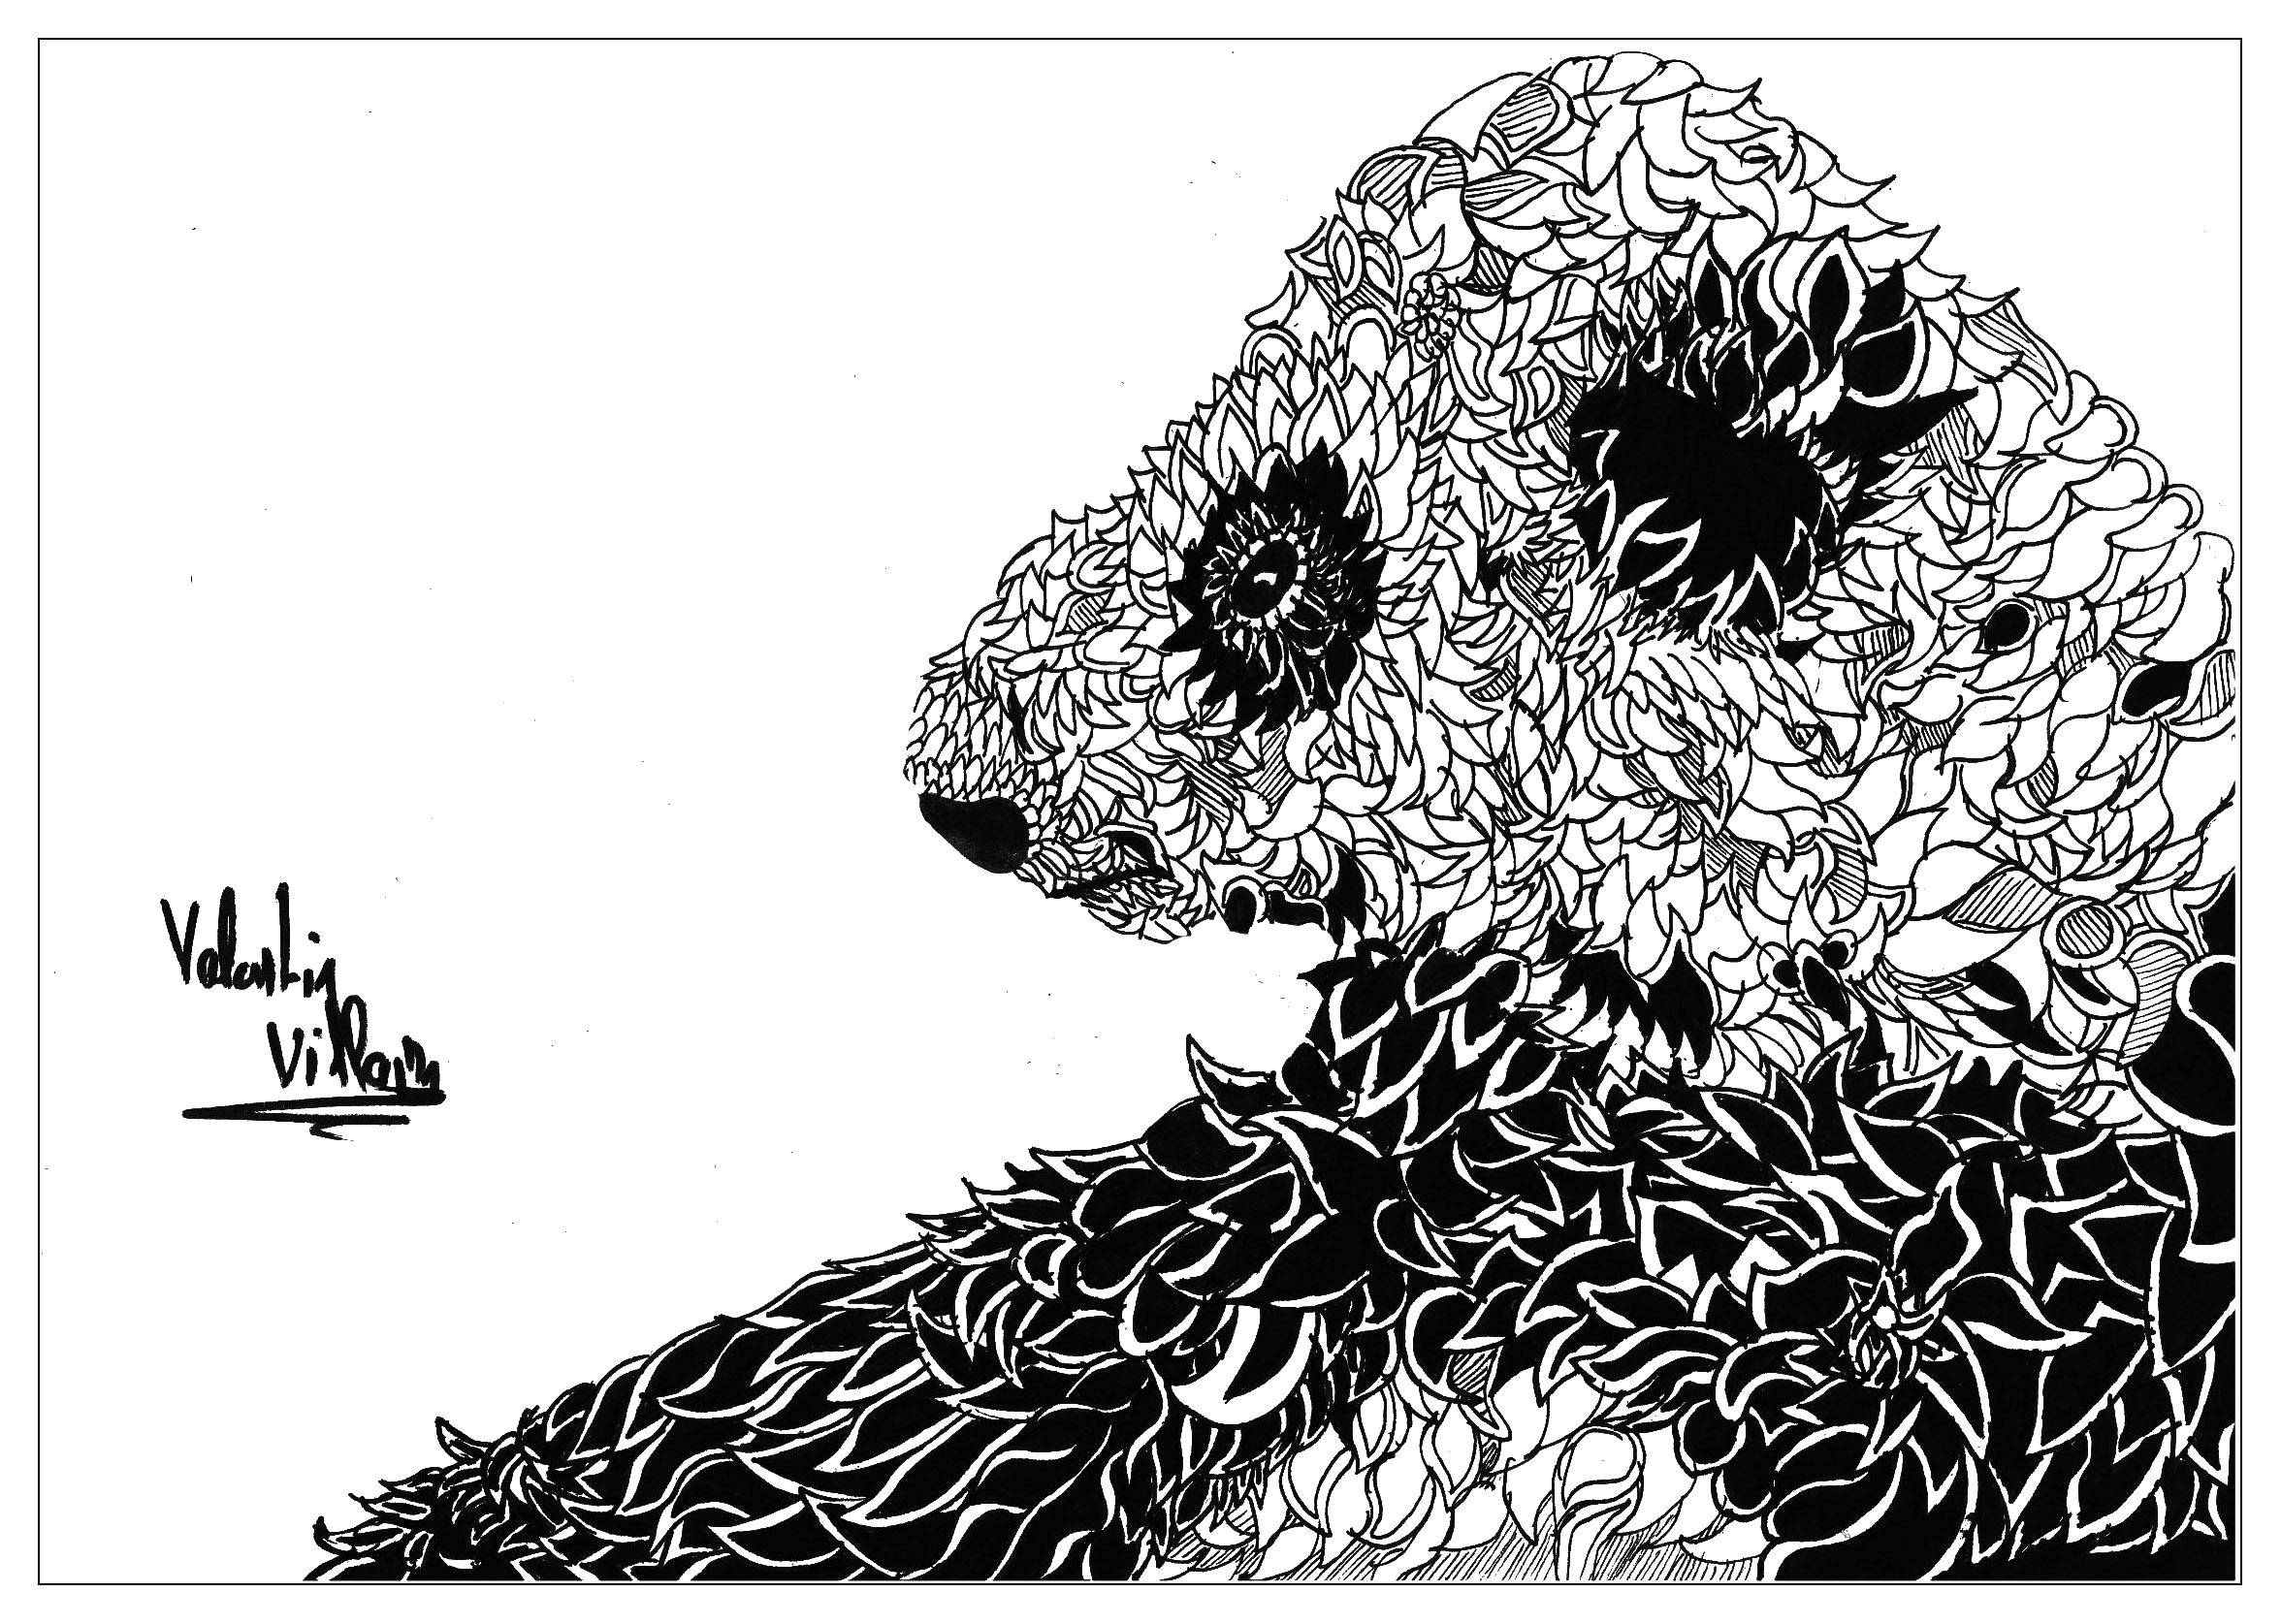 Название: Раскраска Панда из листьев. Категория: раскраски антистресс. Теги: Антистресс.